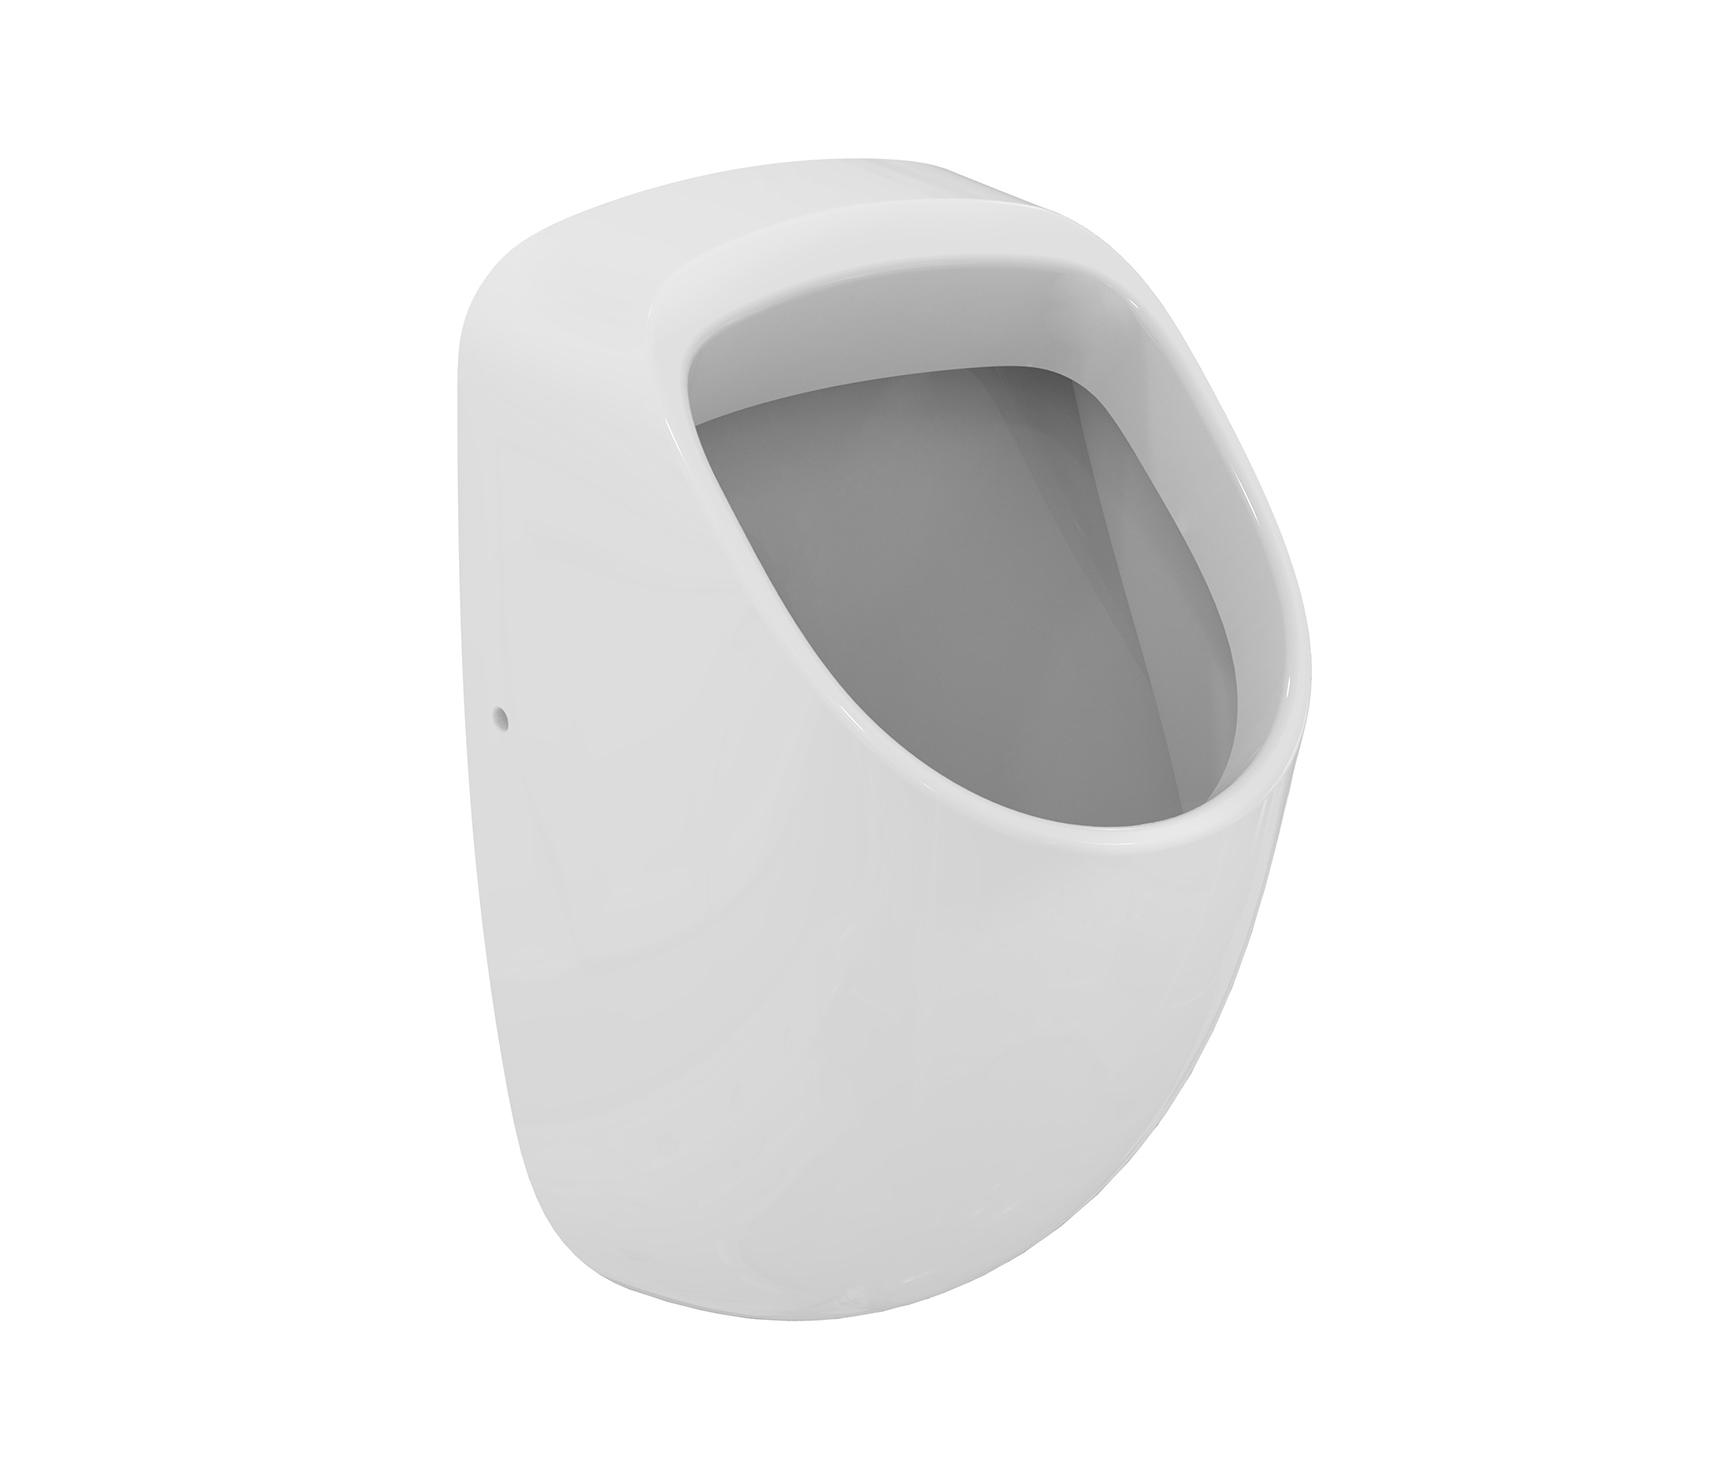 connect absaugeurinal zulauf von hinten urinals from ideal standard architonic. Black Bedroom Furniture Sets. Home Design Ideas